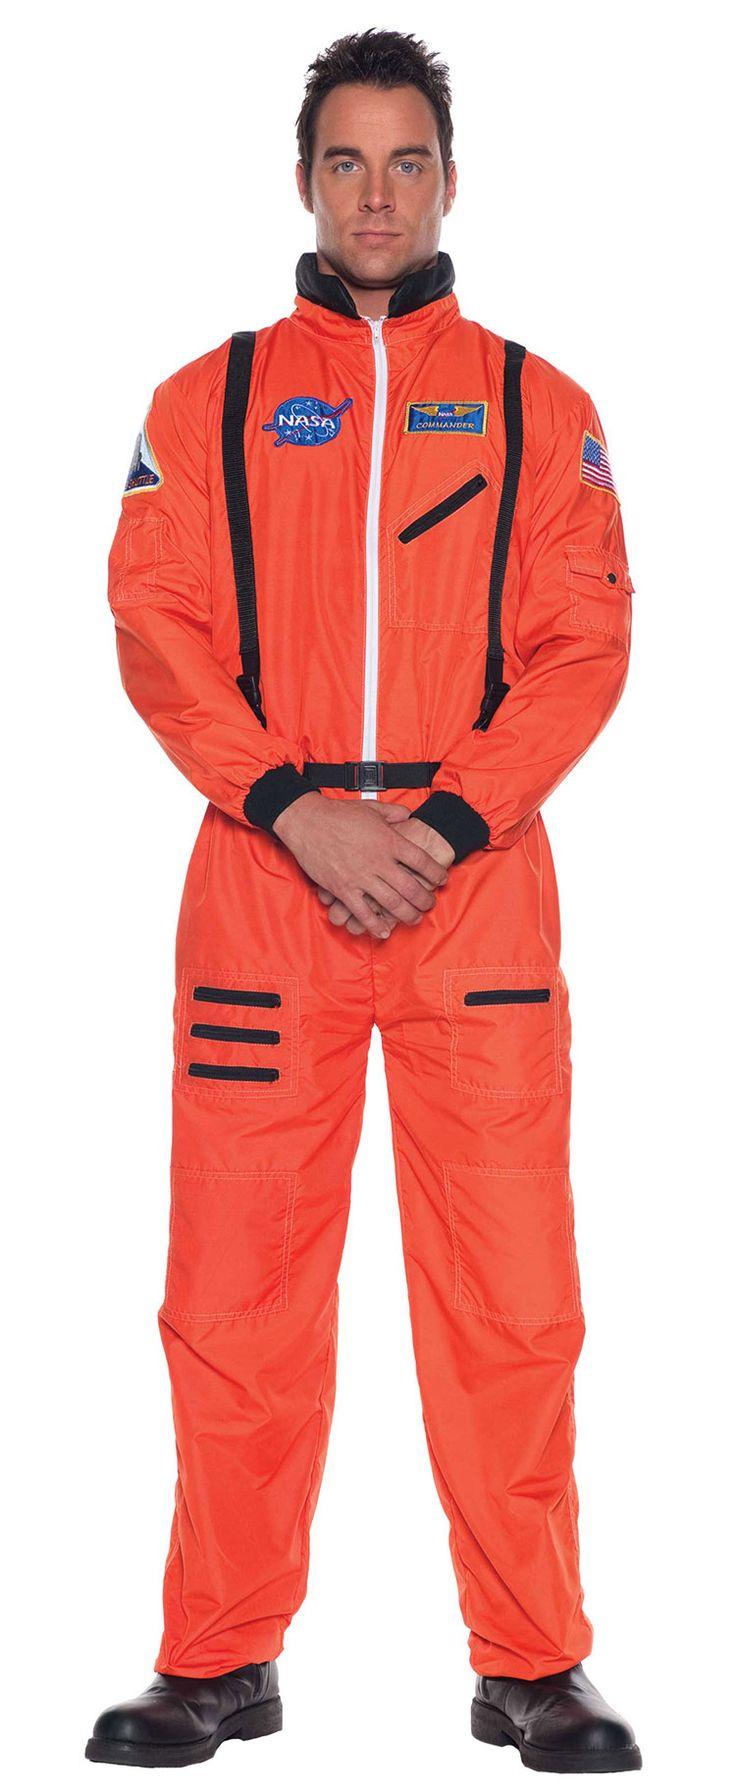 gay astronaut halloween costume - photo #4